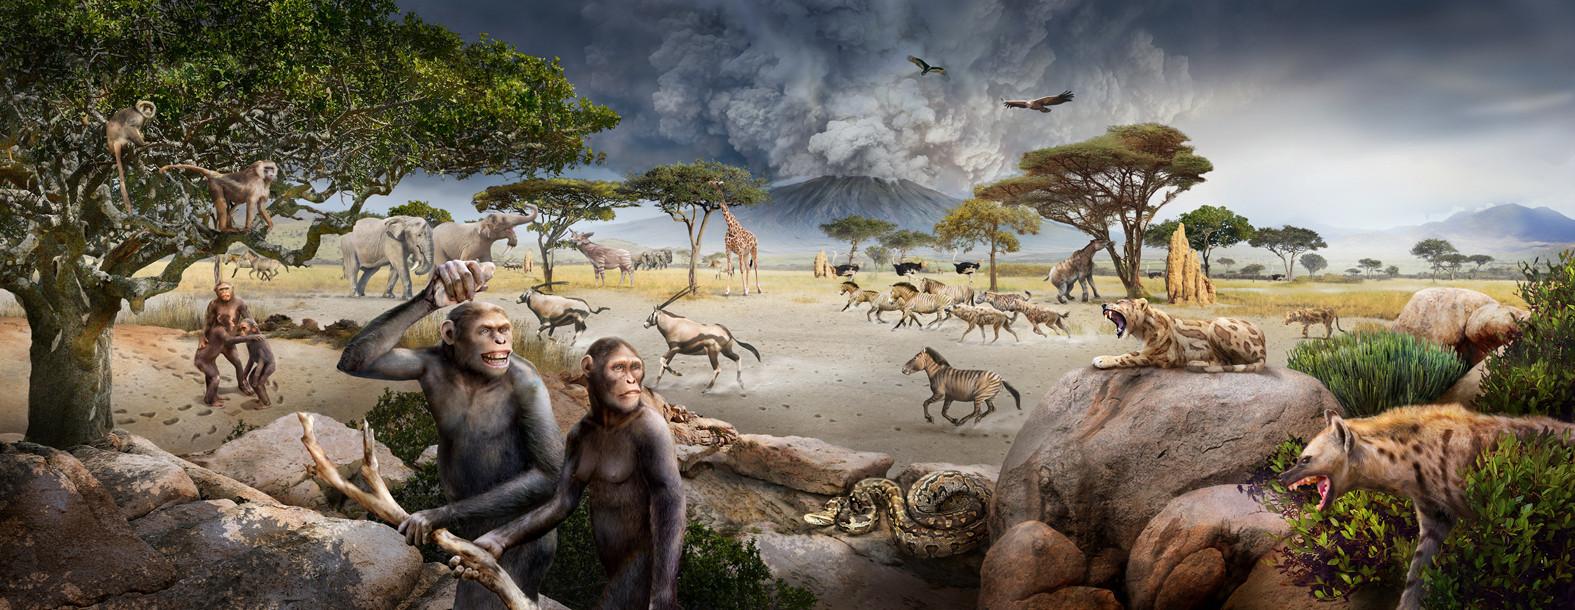 early people in Laetoli